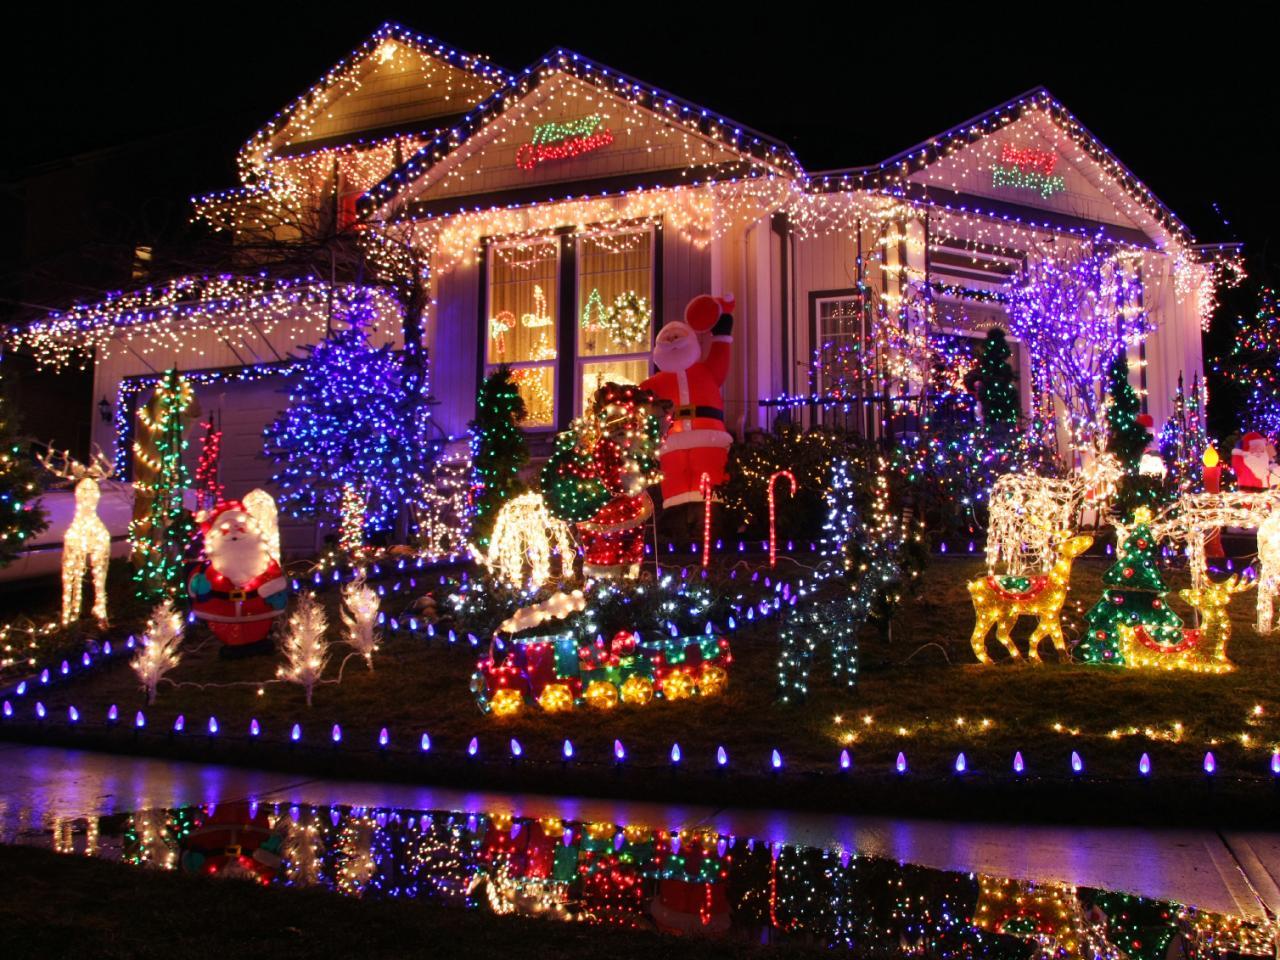 c9-outdoor-christmas-lights-photo-12